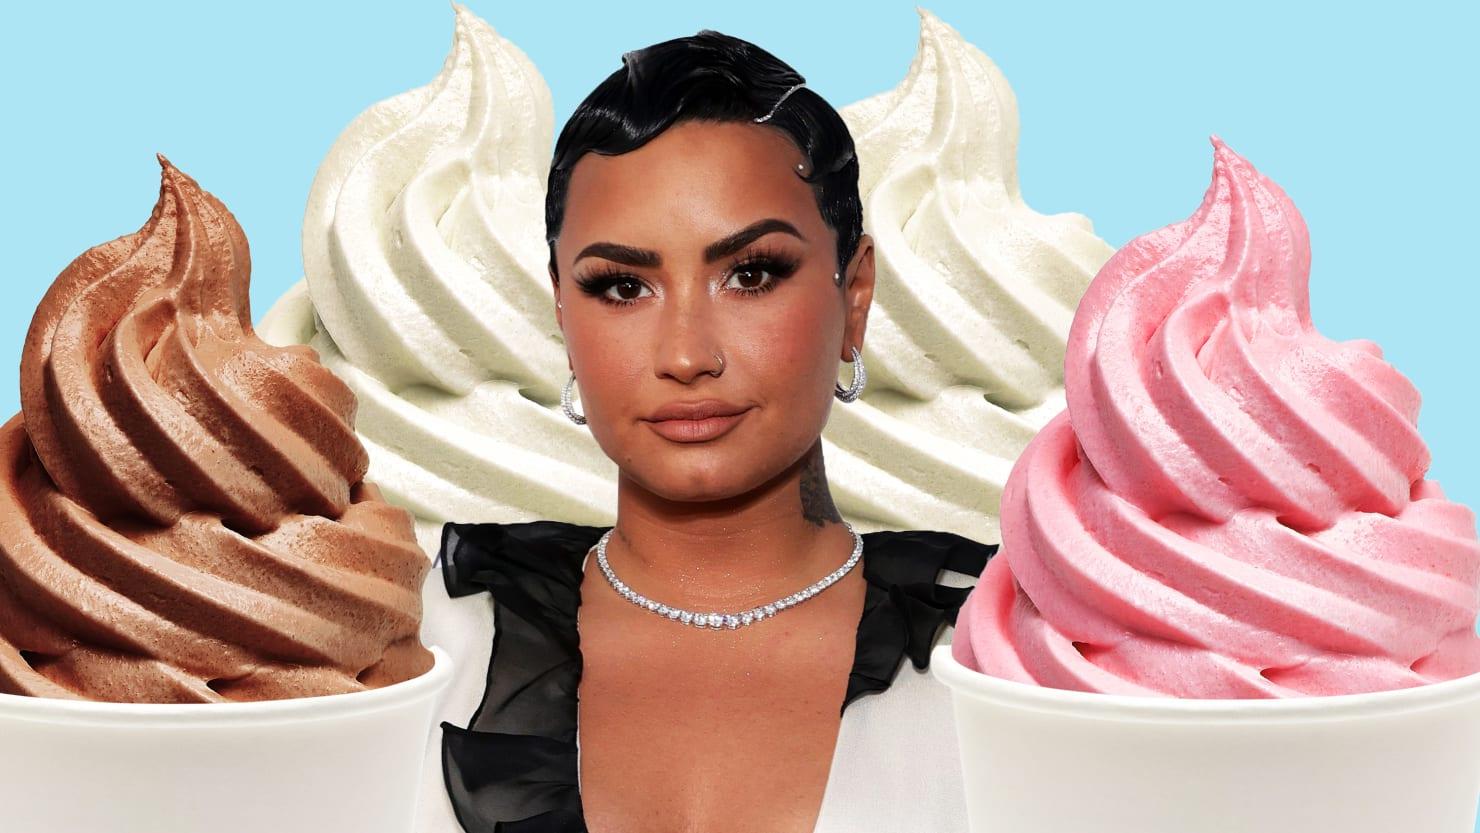 Demi Lovato's ridiculously privileged crusade against a frozen yogurt shop